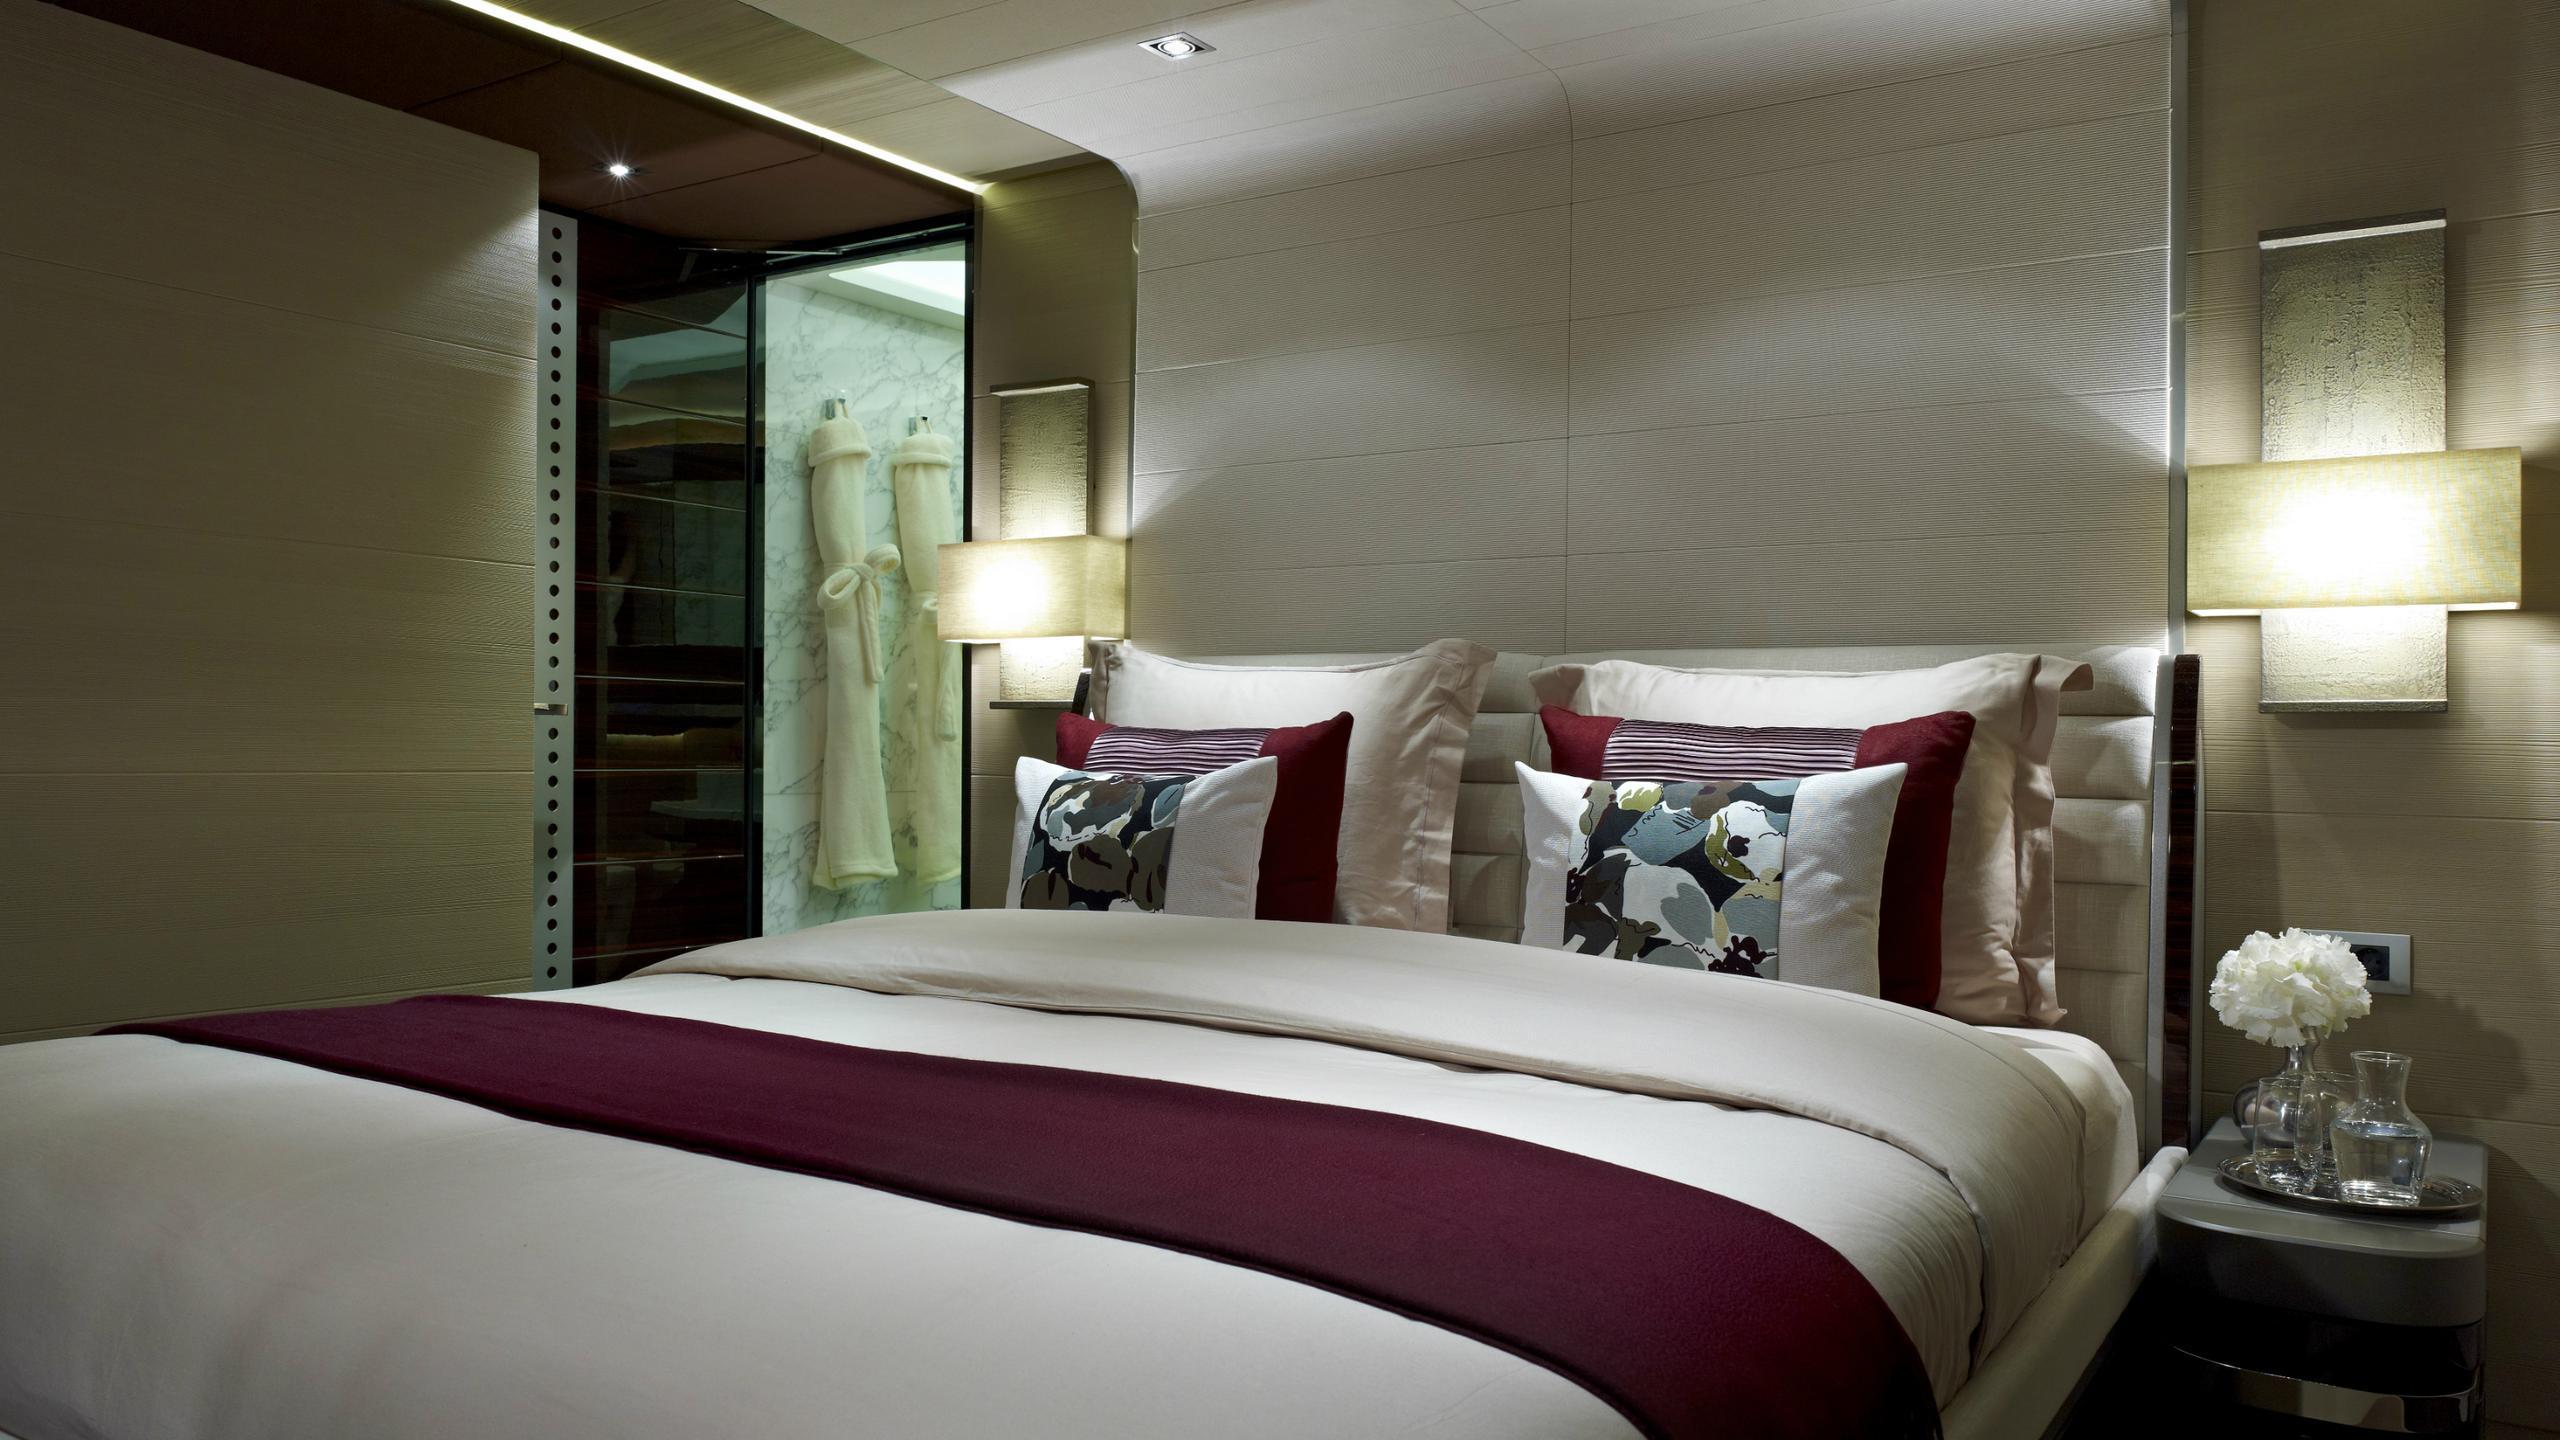 odyssea-como-lady-petra-motor-yacht-heesen-2012-47m-double-bedroom